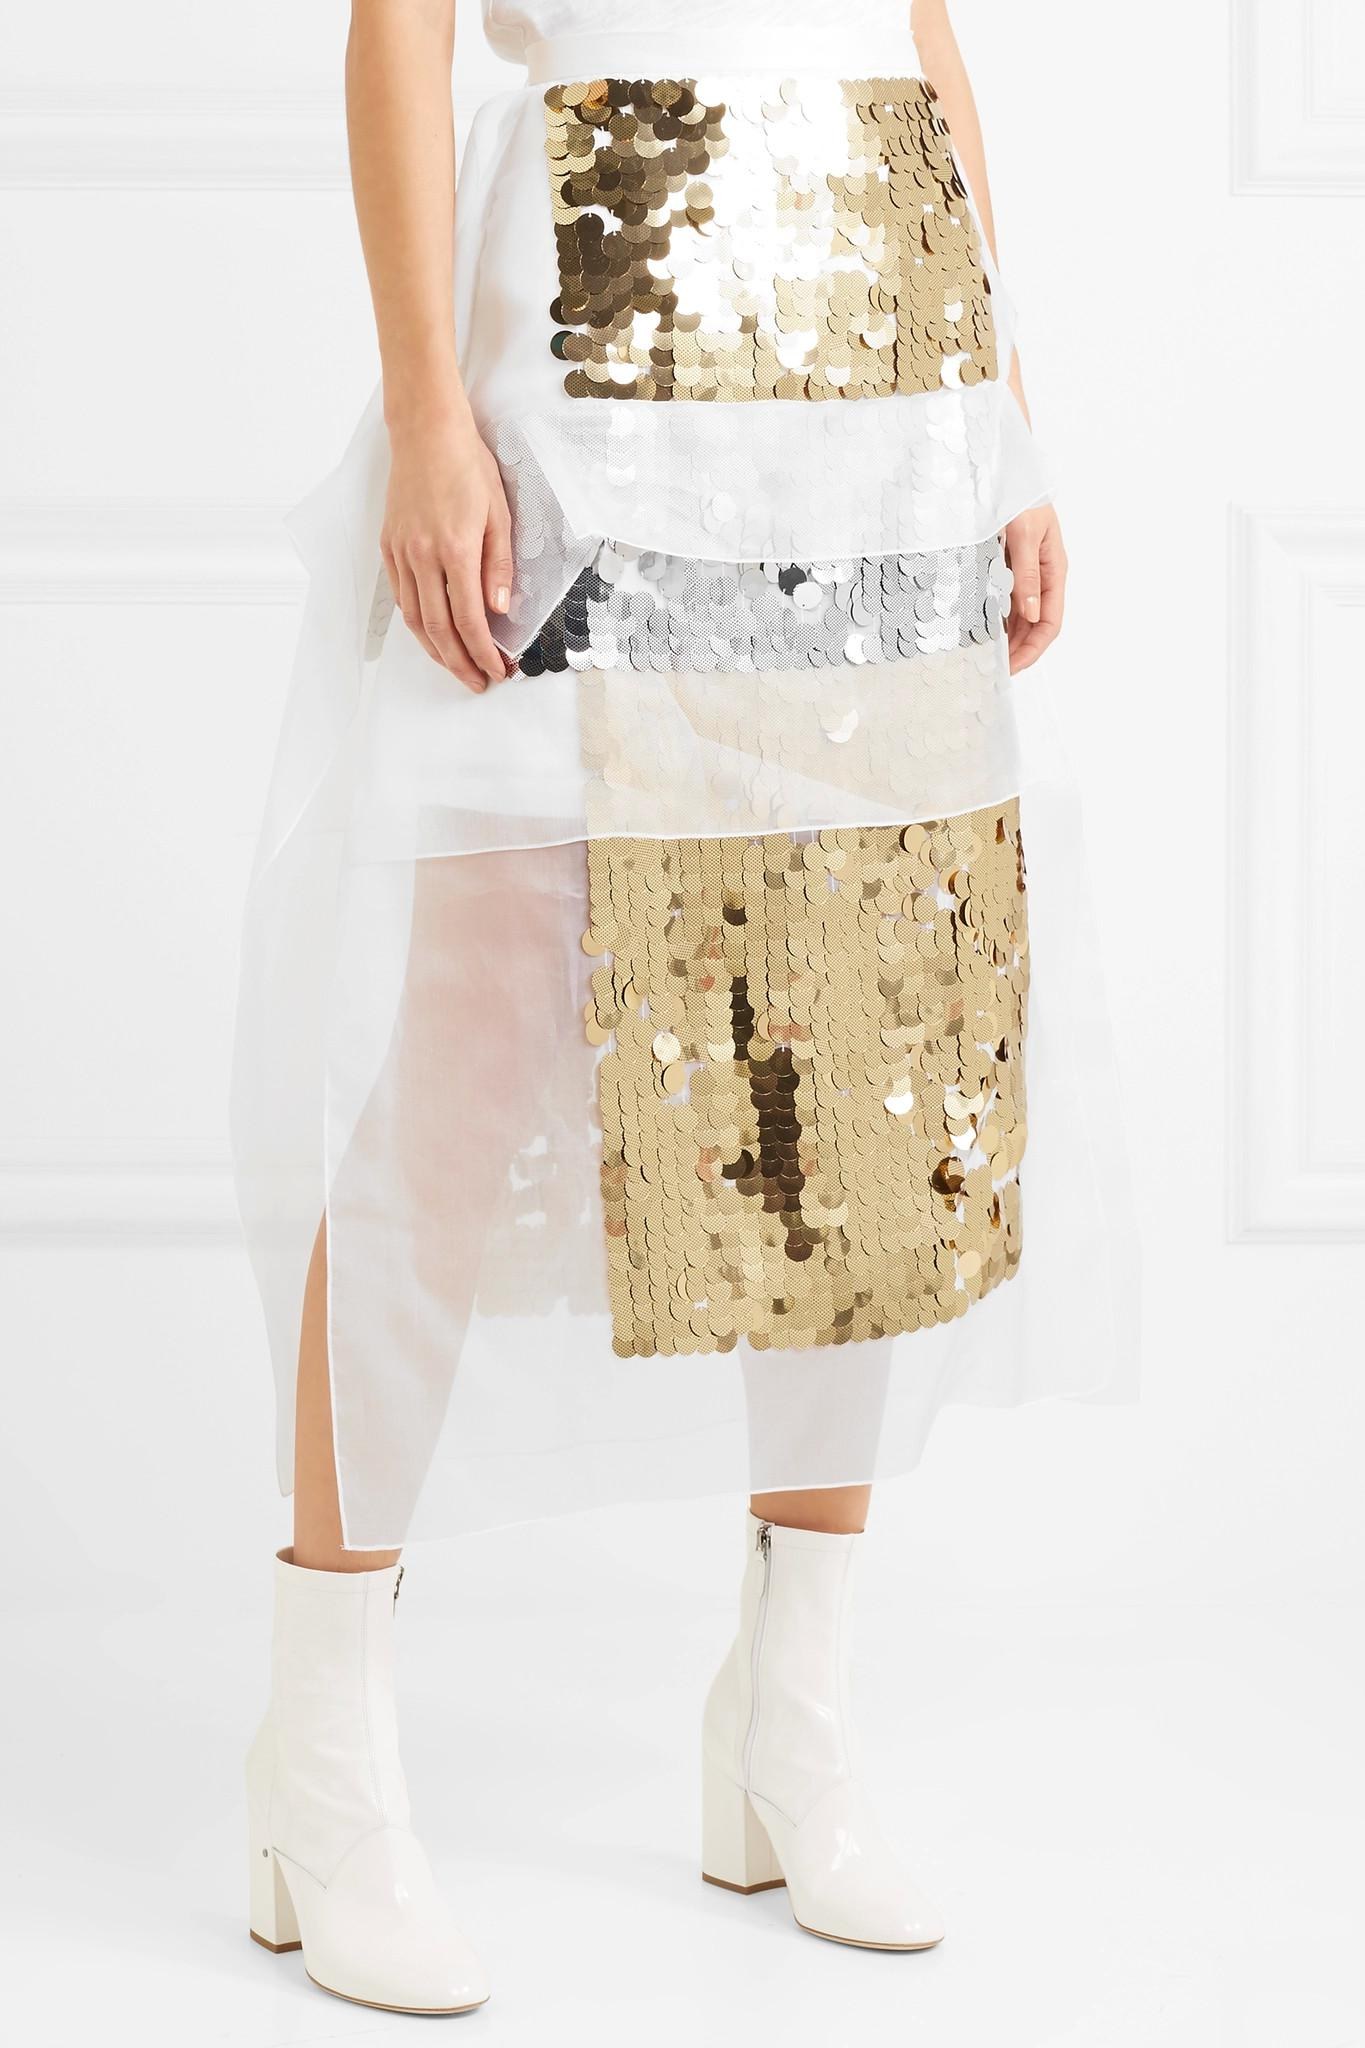 Sequined Organza And Hammered Silk-satin Midi Skirt - Gold Christopher Kane Sale Visit Huge Surprise For Sale Outlet Eastbay lYCJJ0m